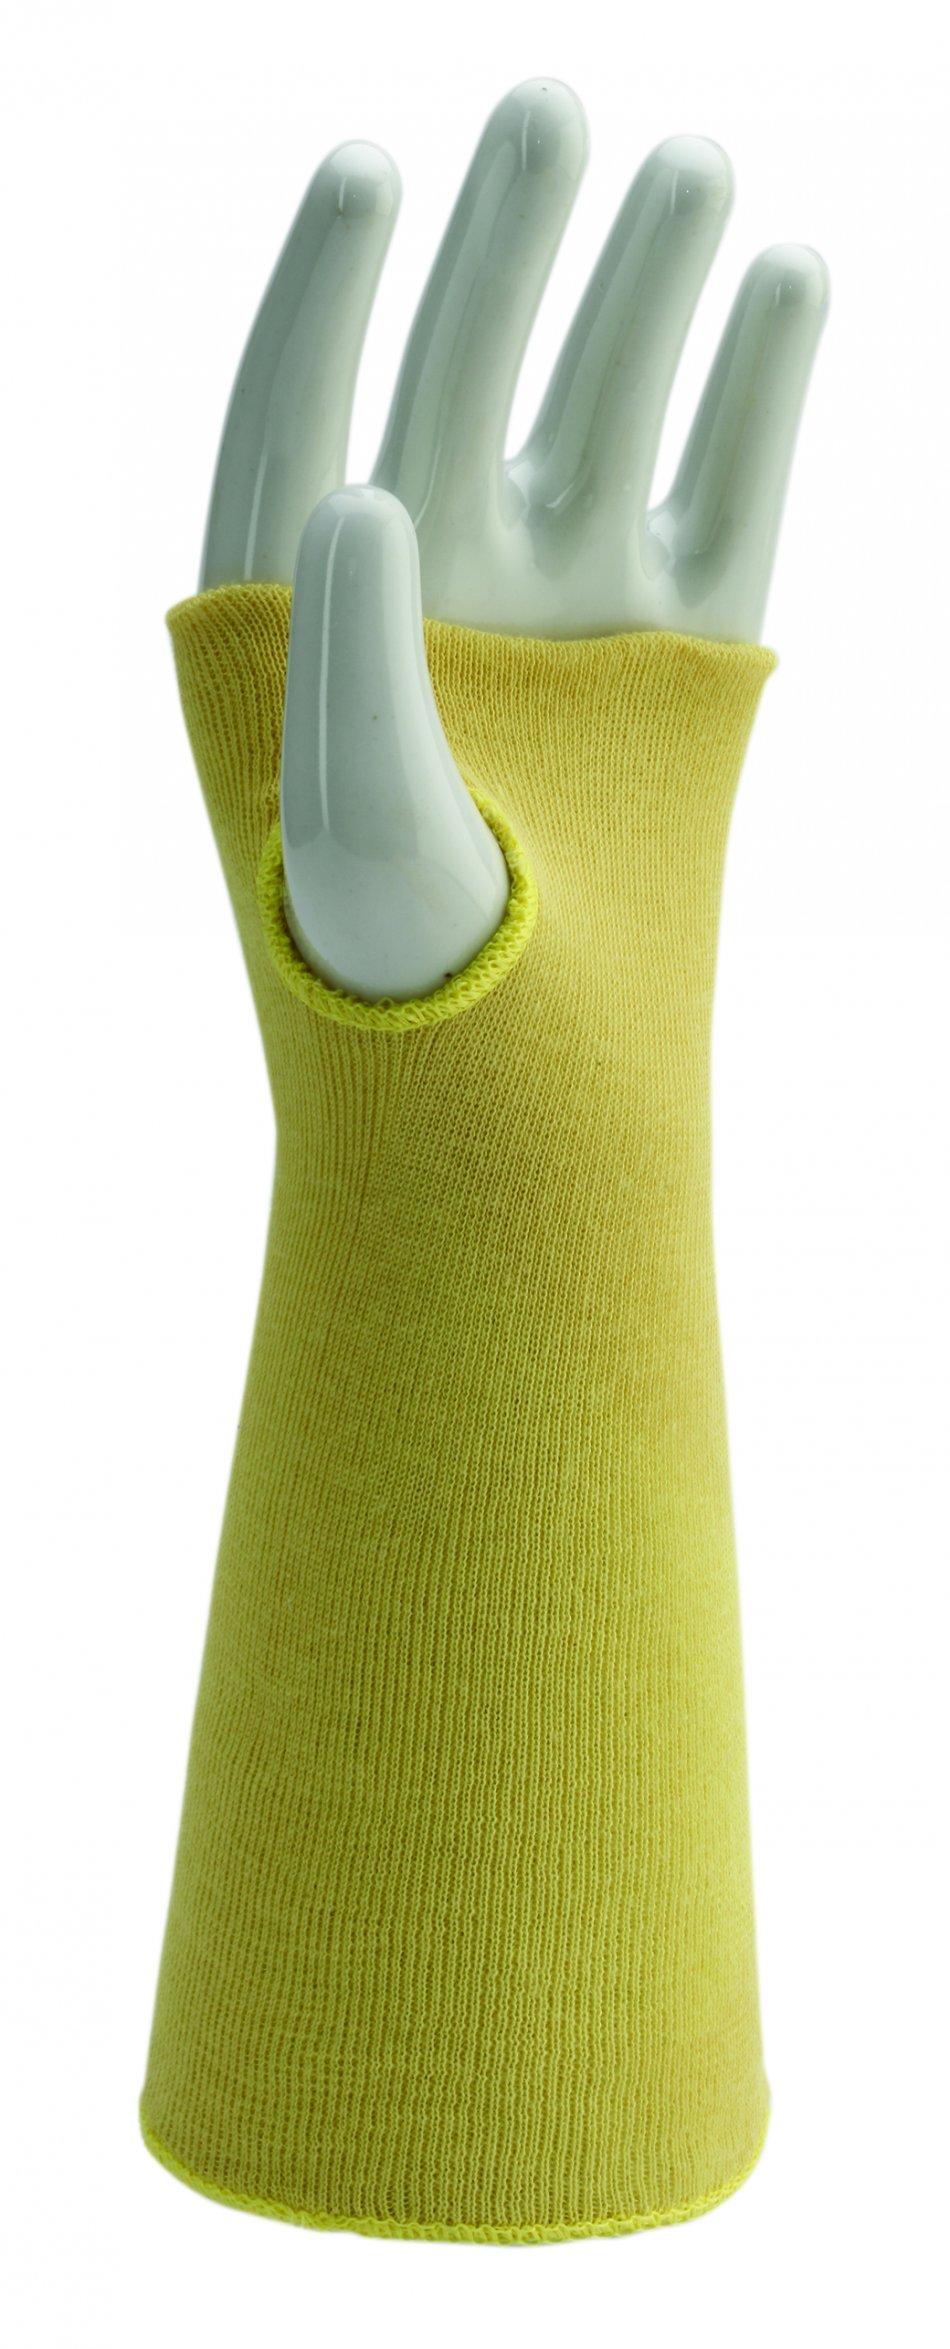 Protector kevlar pentru antebraţ,15 cm